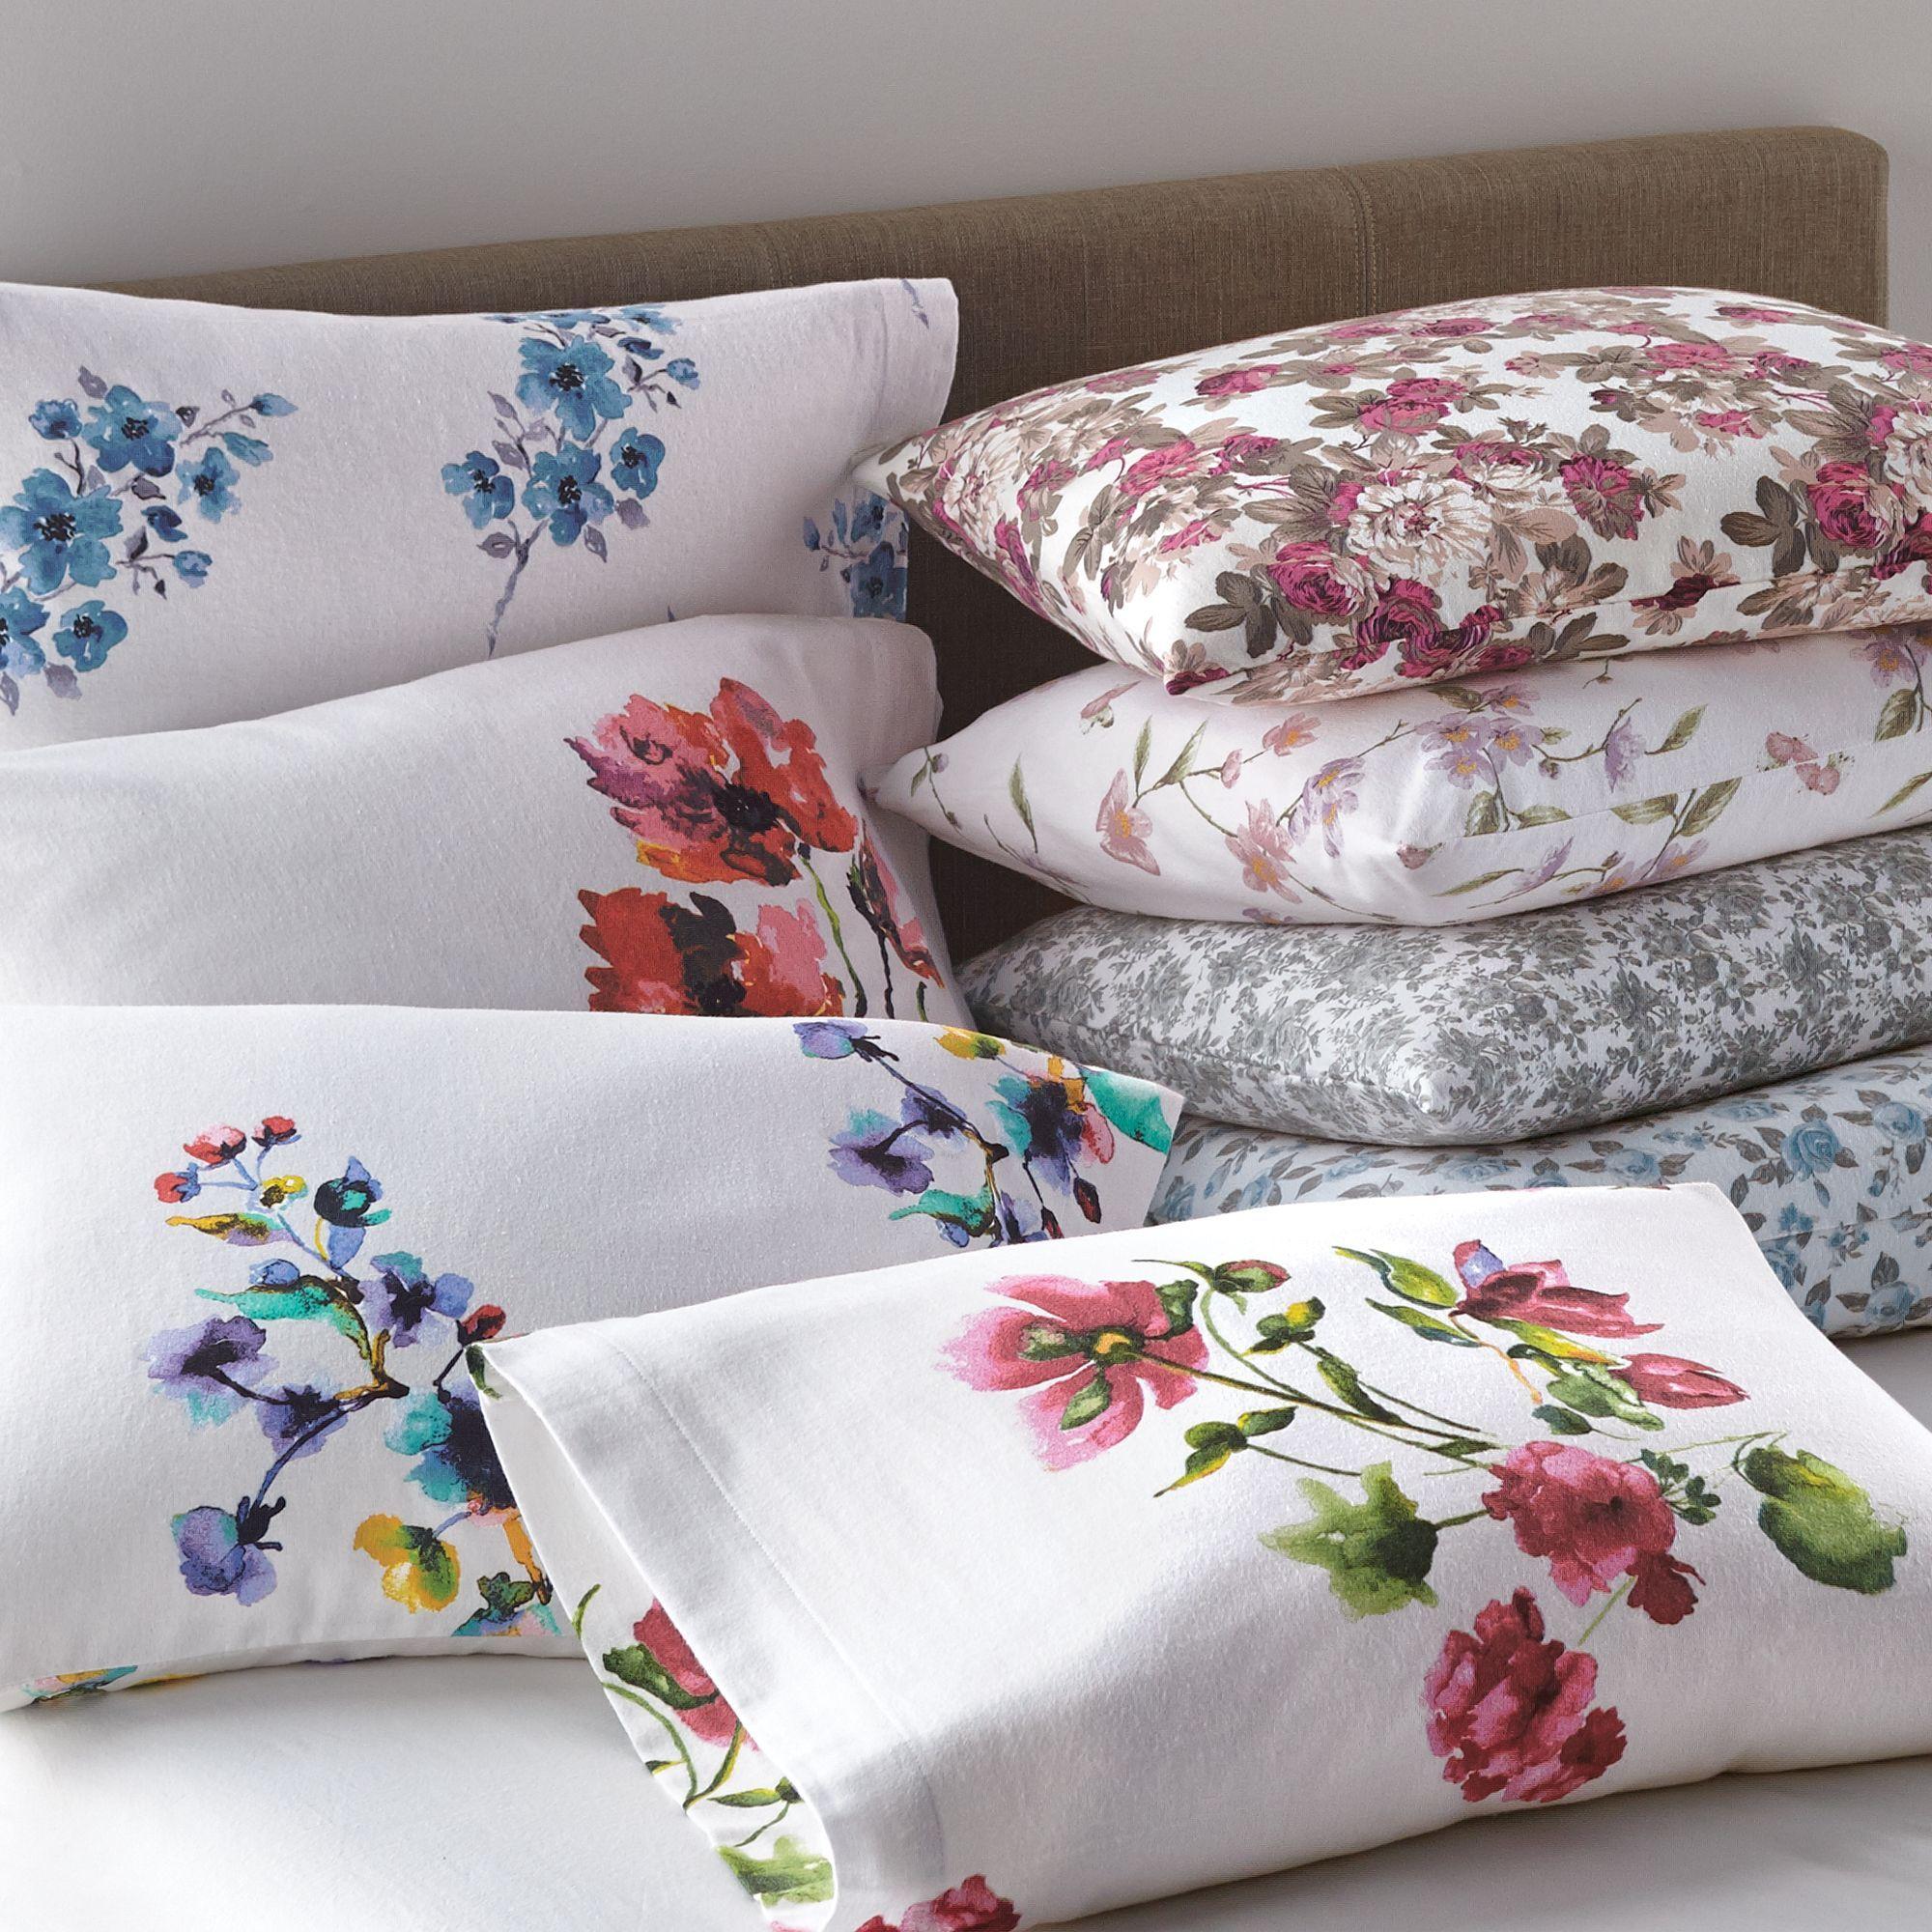 Grand Patrician® Floral Print Cotton Flannel Sheet Set